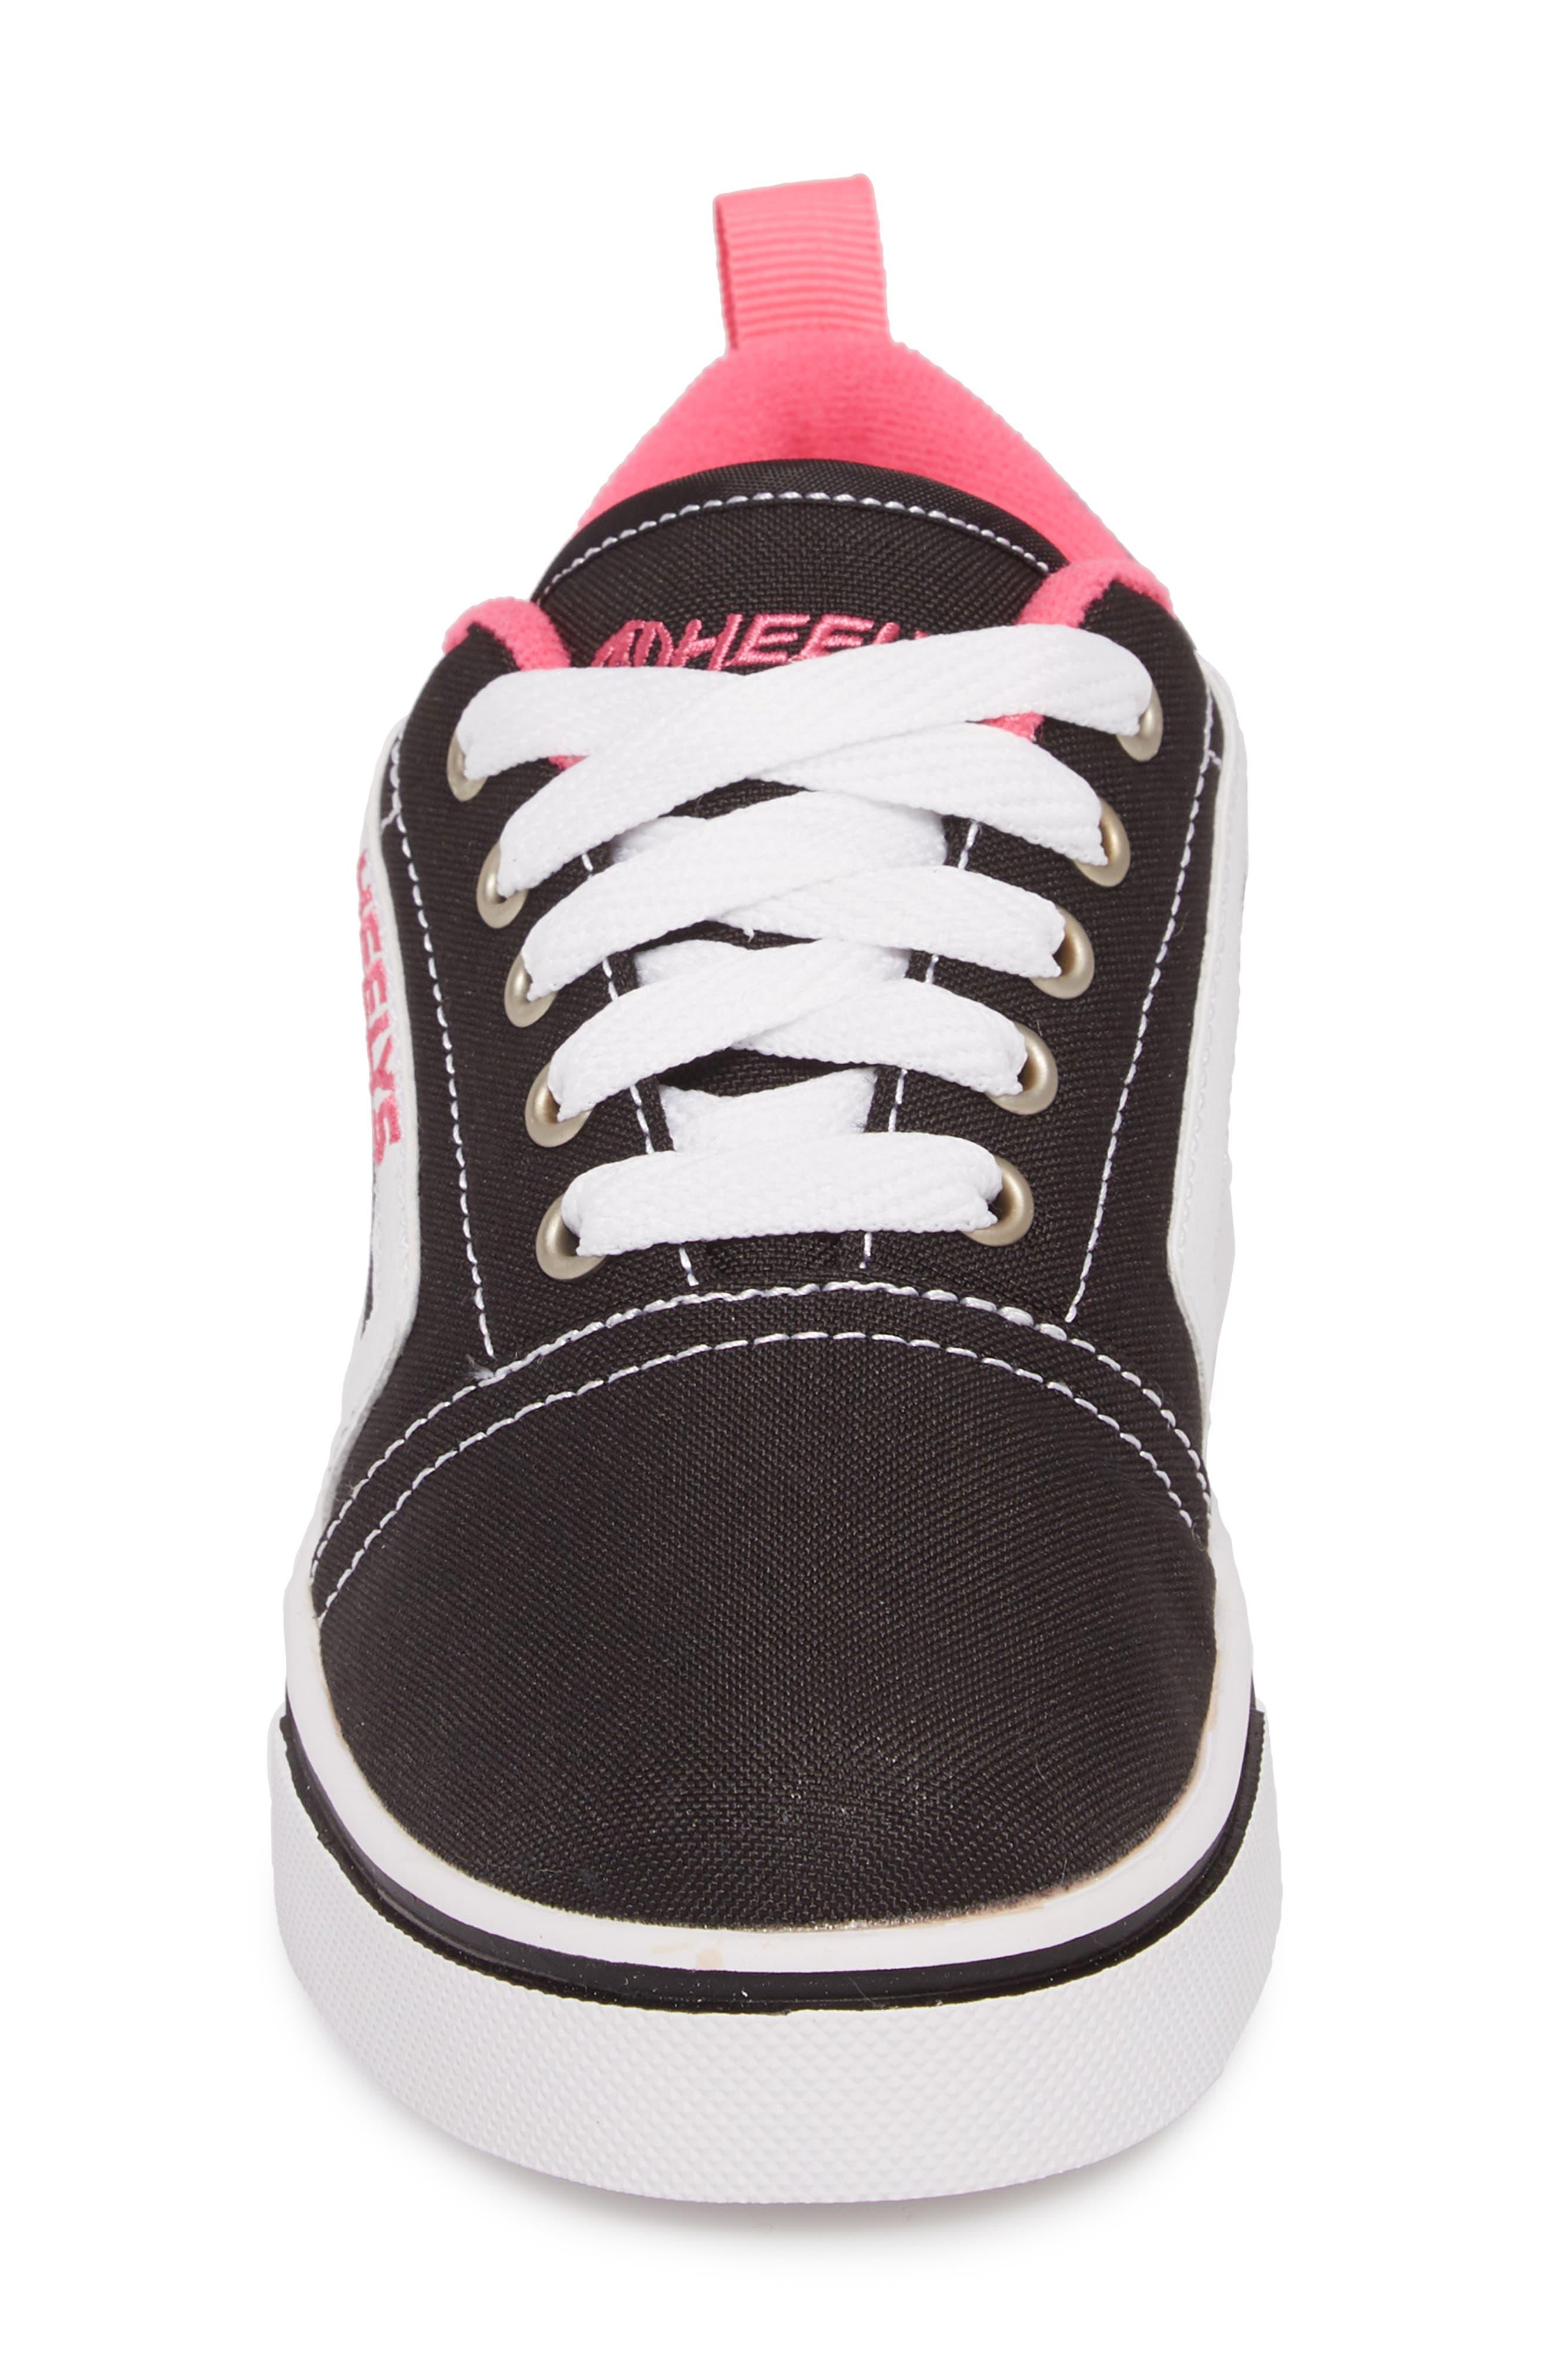 GR8 Pro Wheeled Sneaker,                             Alternate thumbnail 4, color,                             Black/ White/ Hot Pink